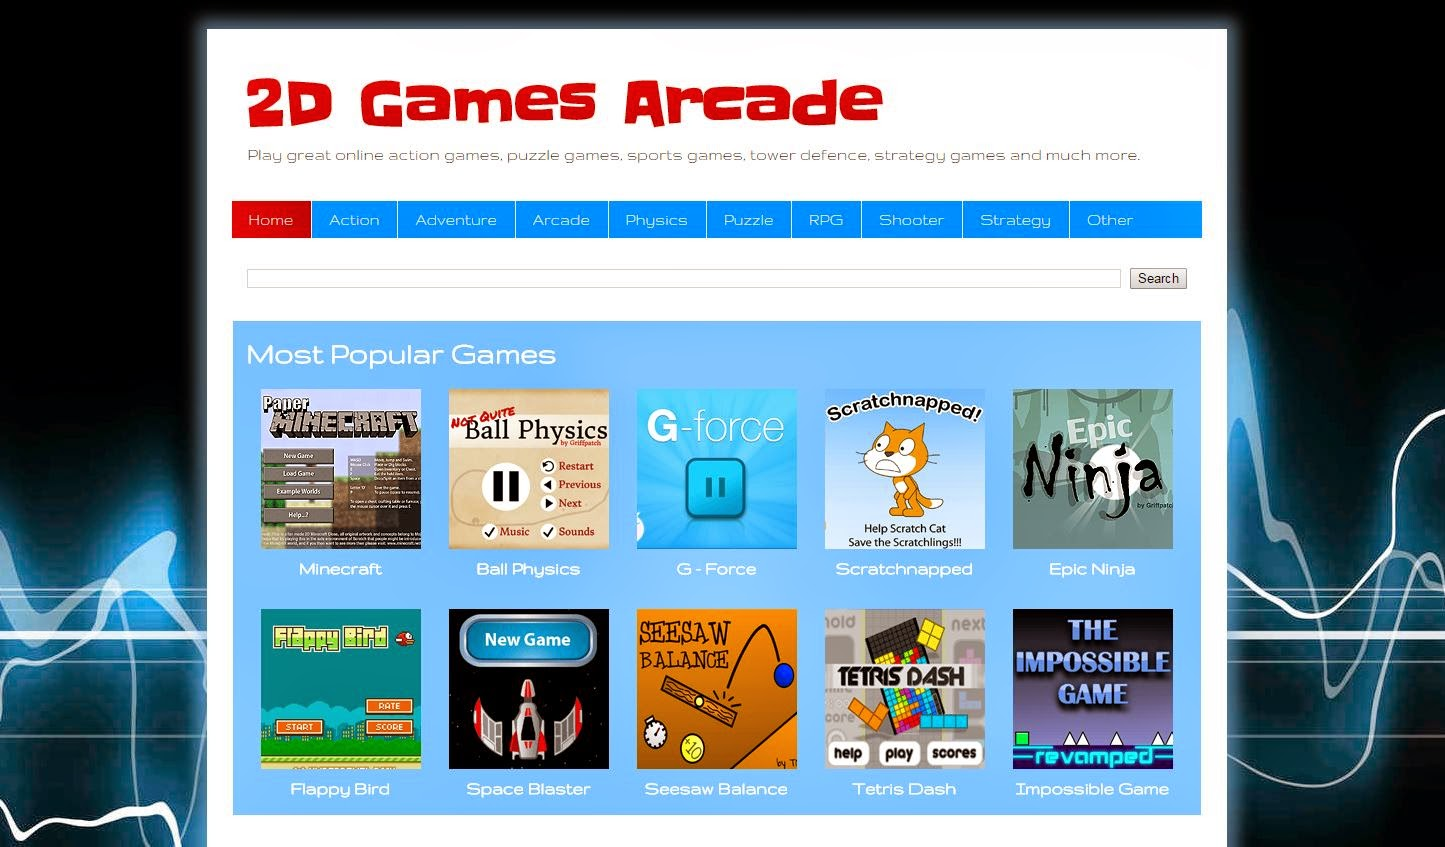 2D Games Arcade Website